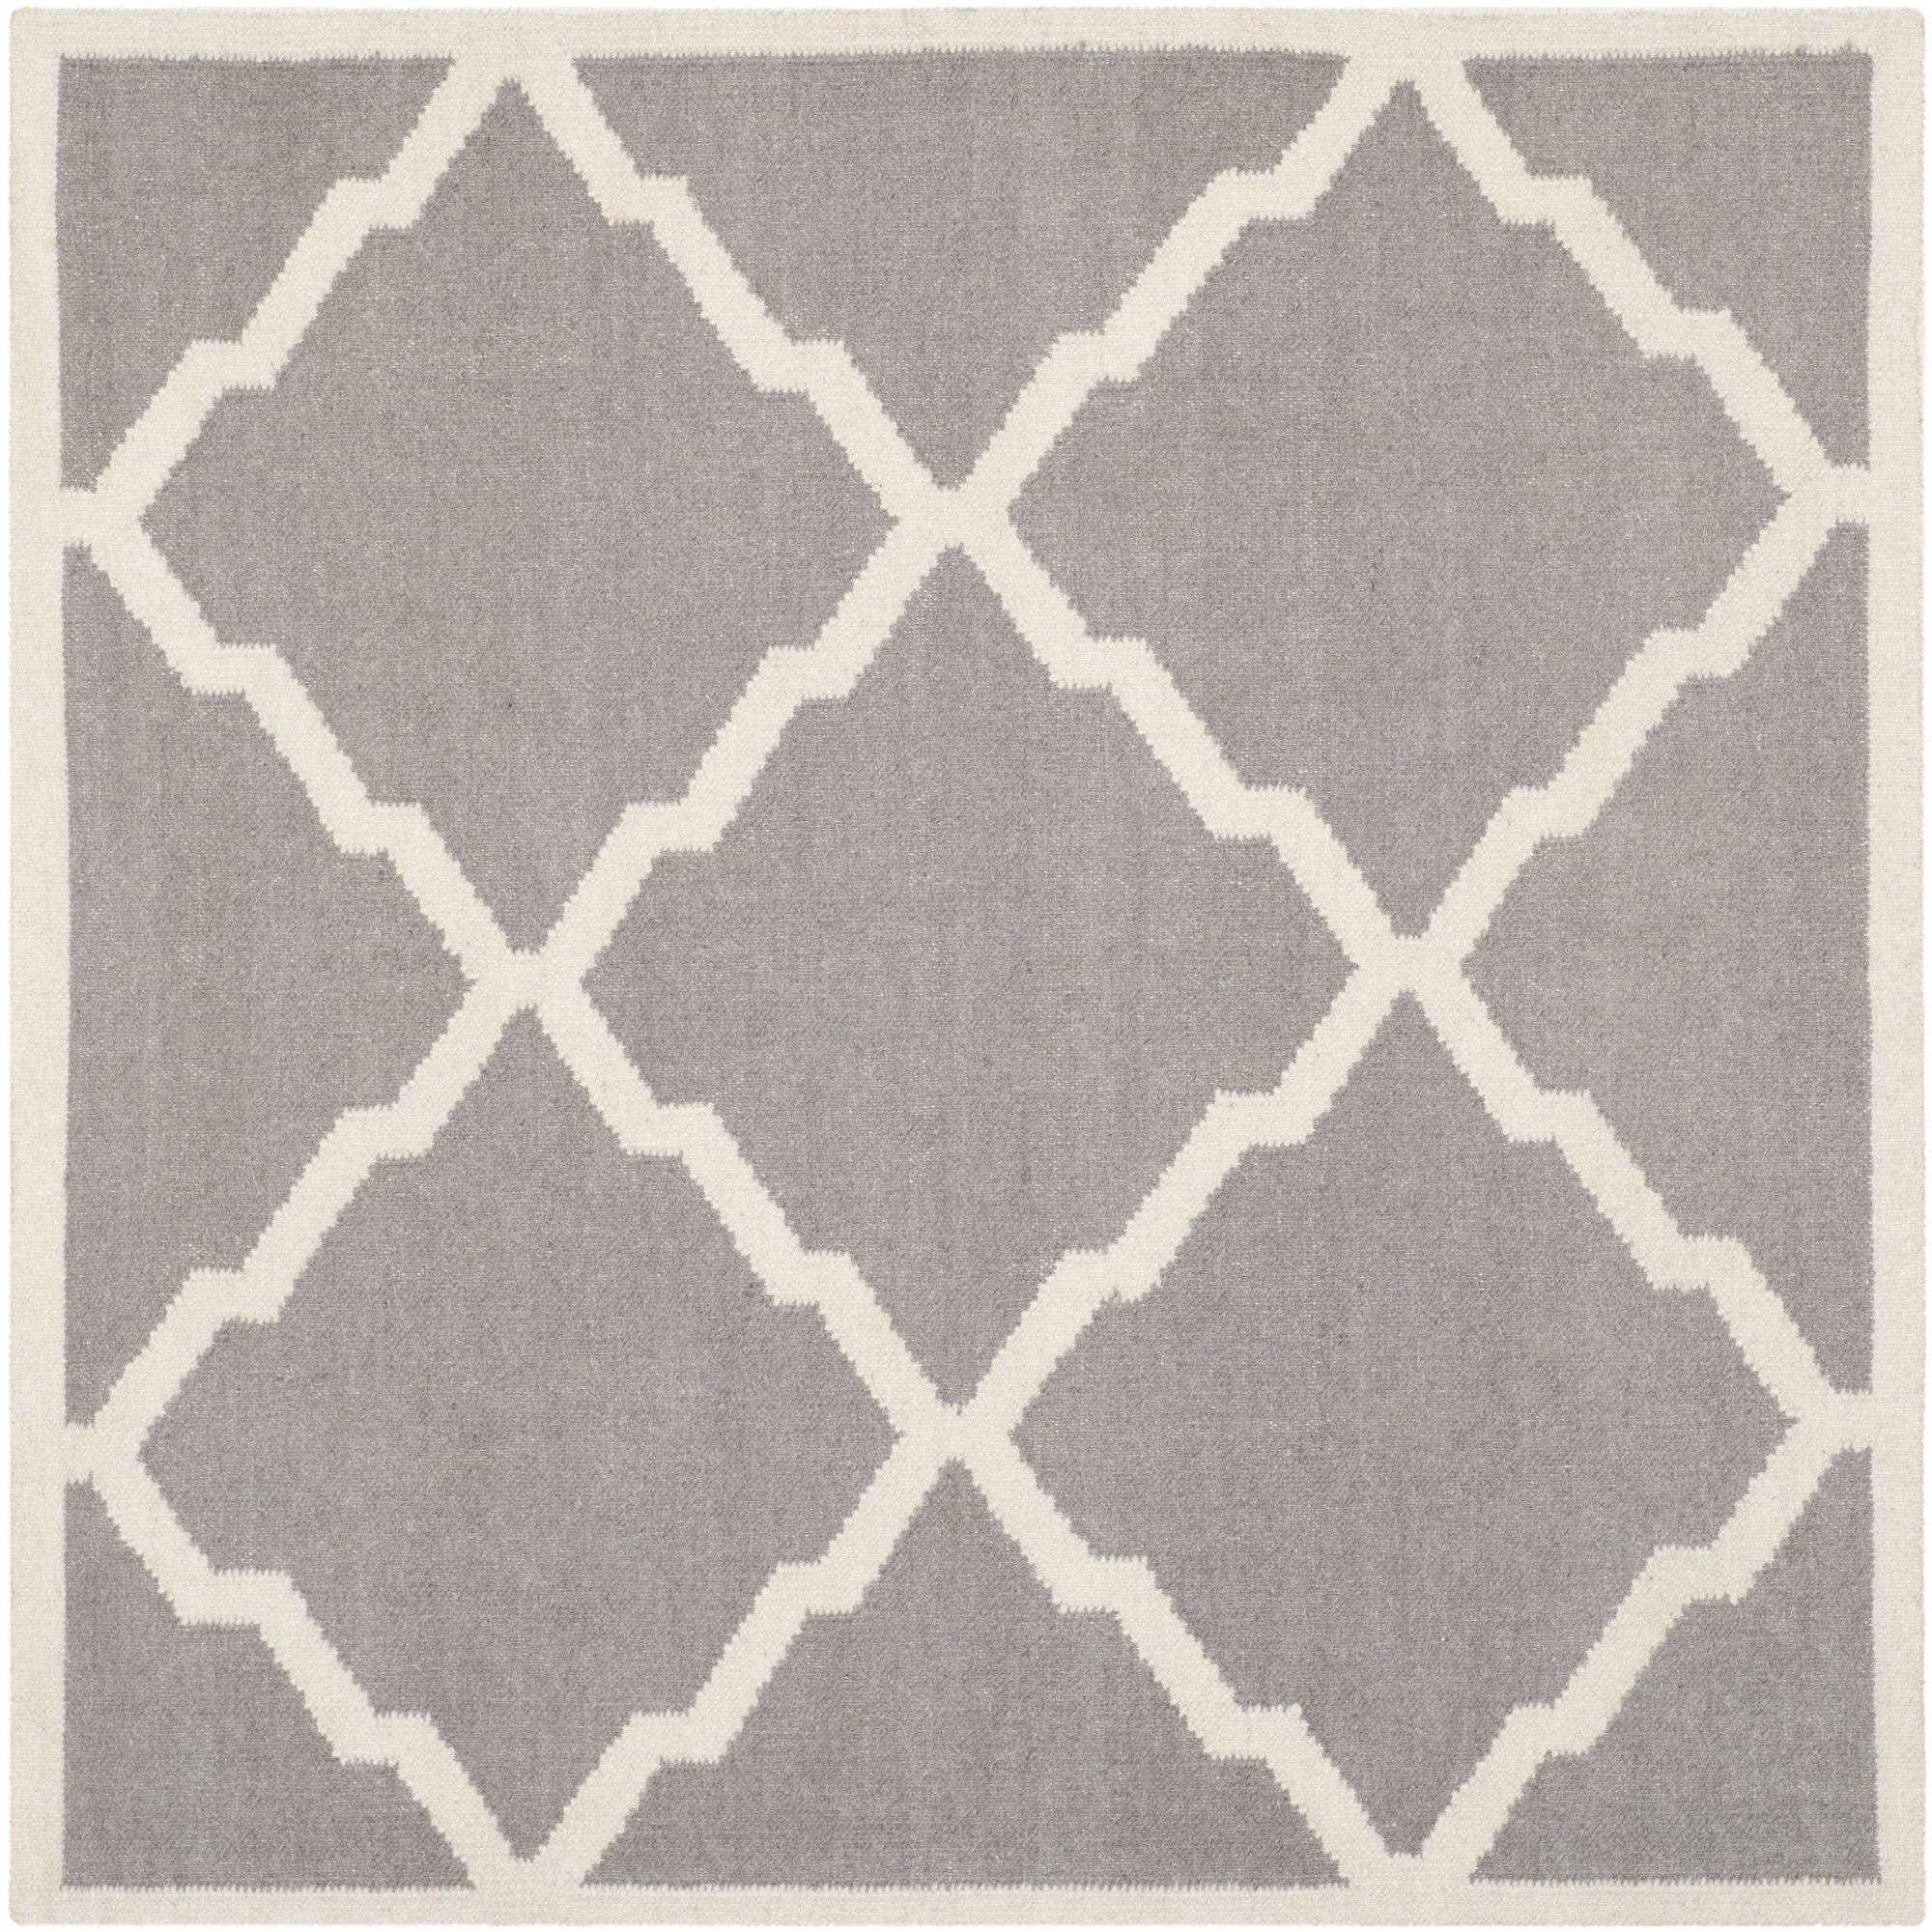 Brambach Handwoven Wool Grey Area Rug Moroccan Area Rug